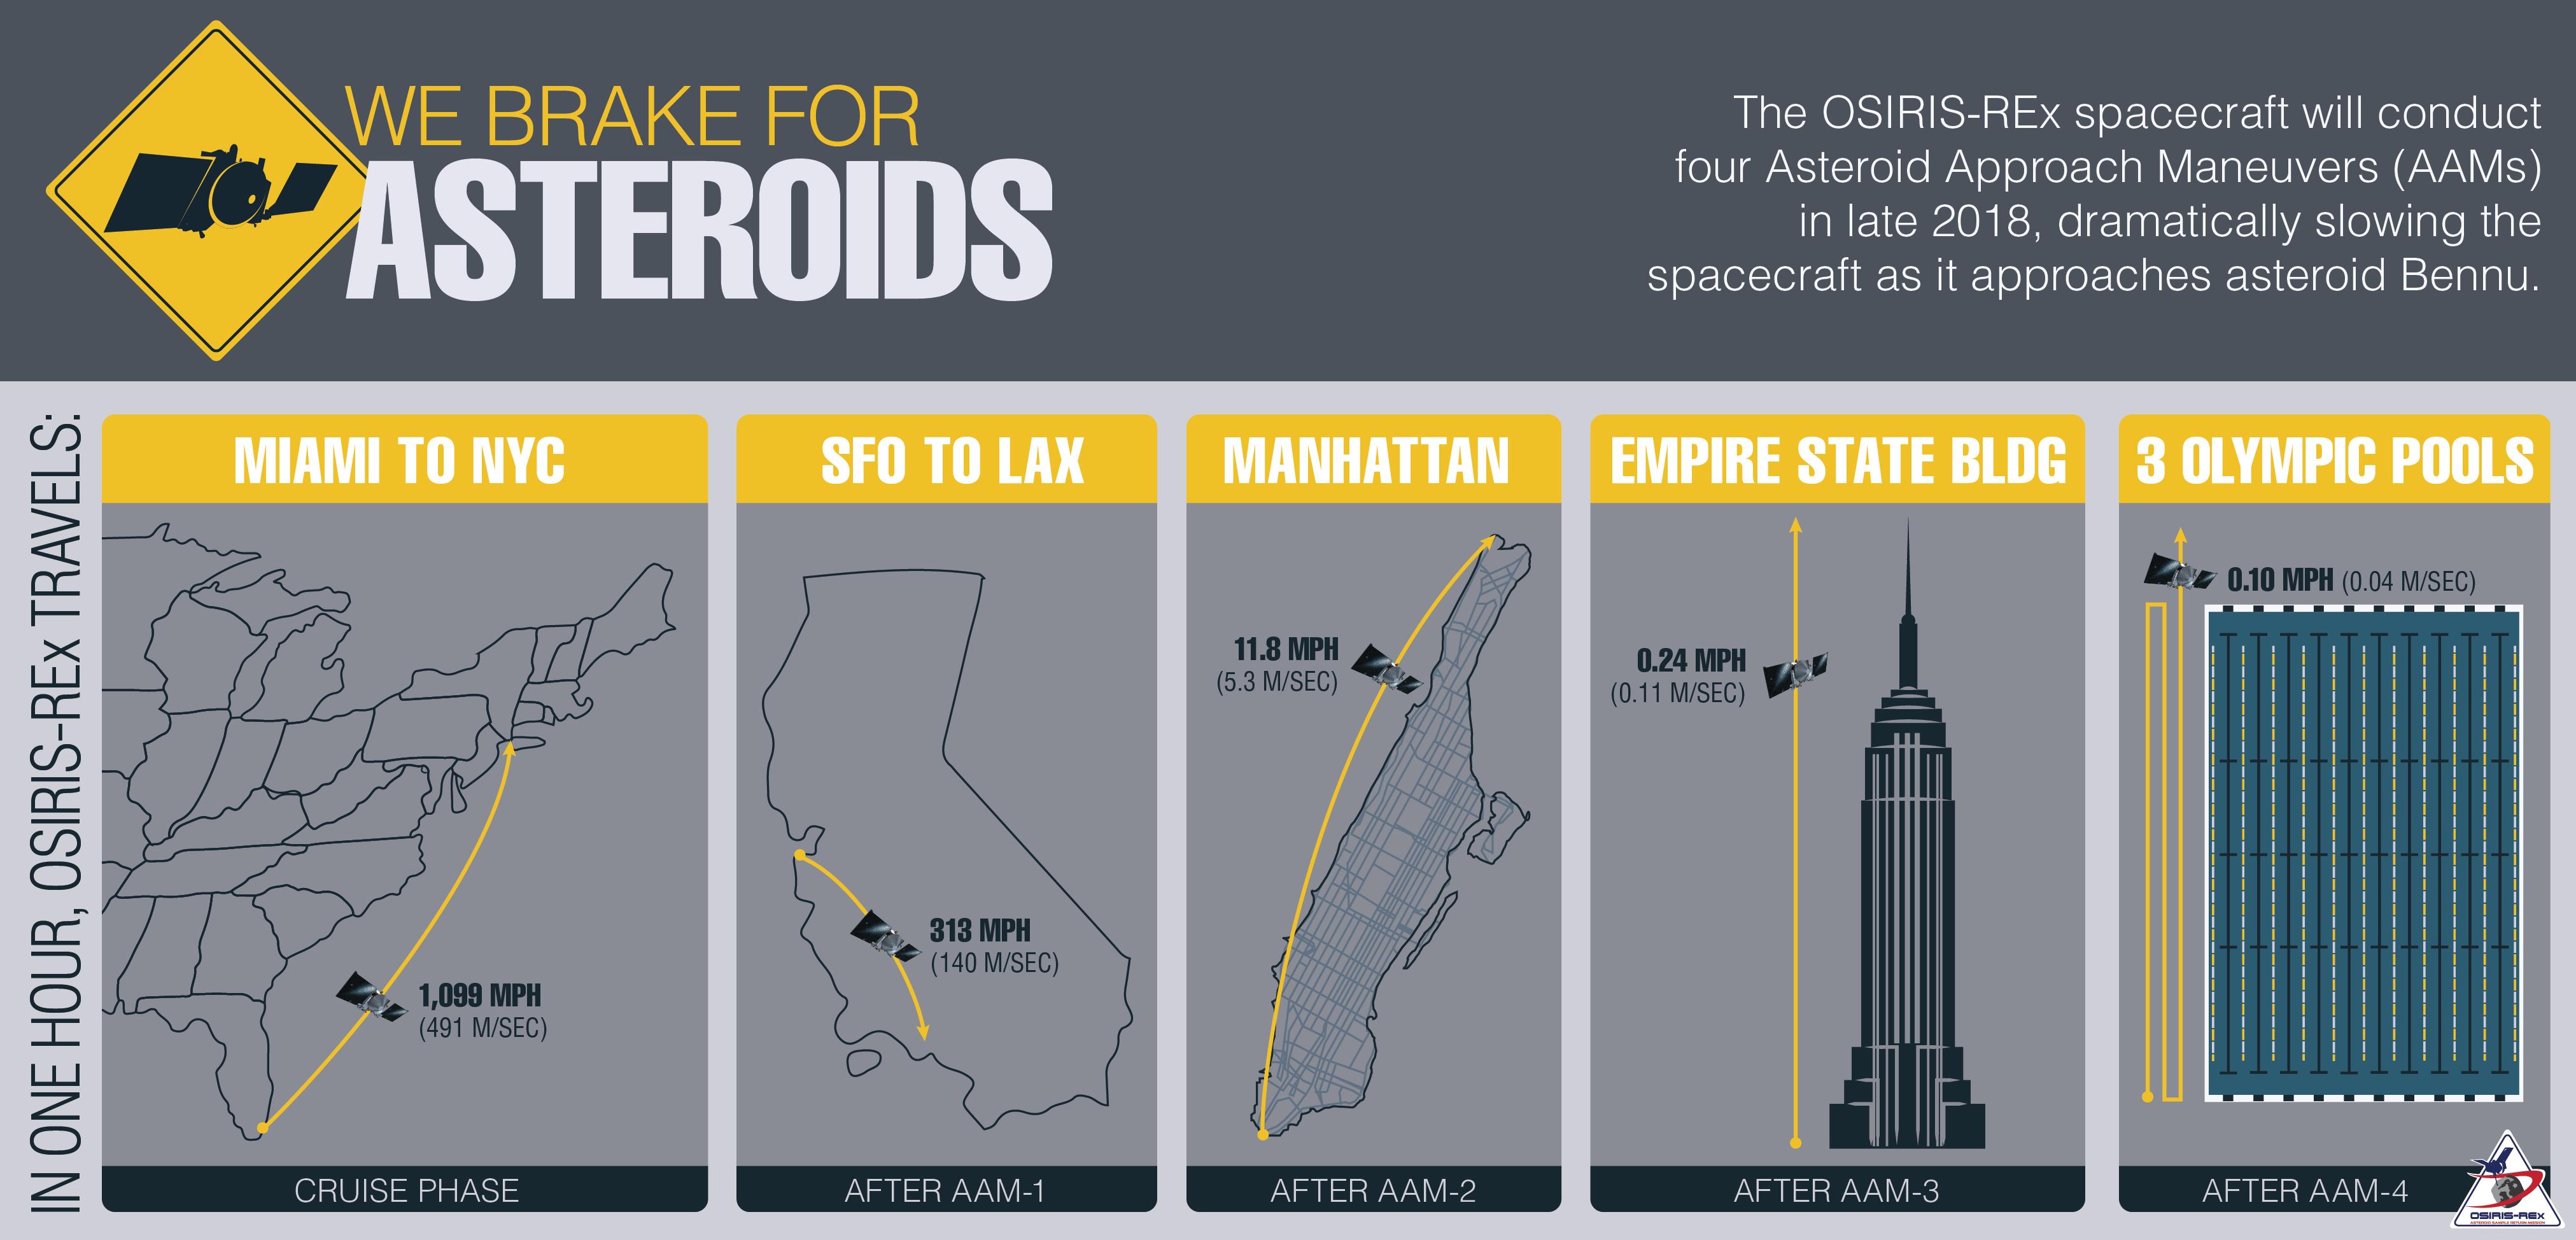 OSIRIS-REx Asteroid Approach Maneuver Infographic